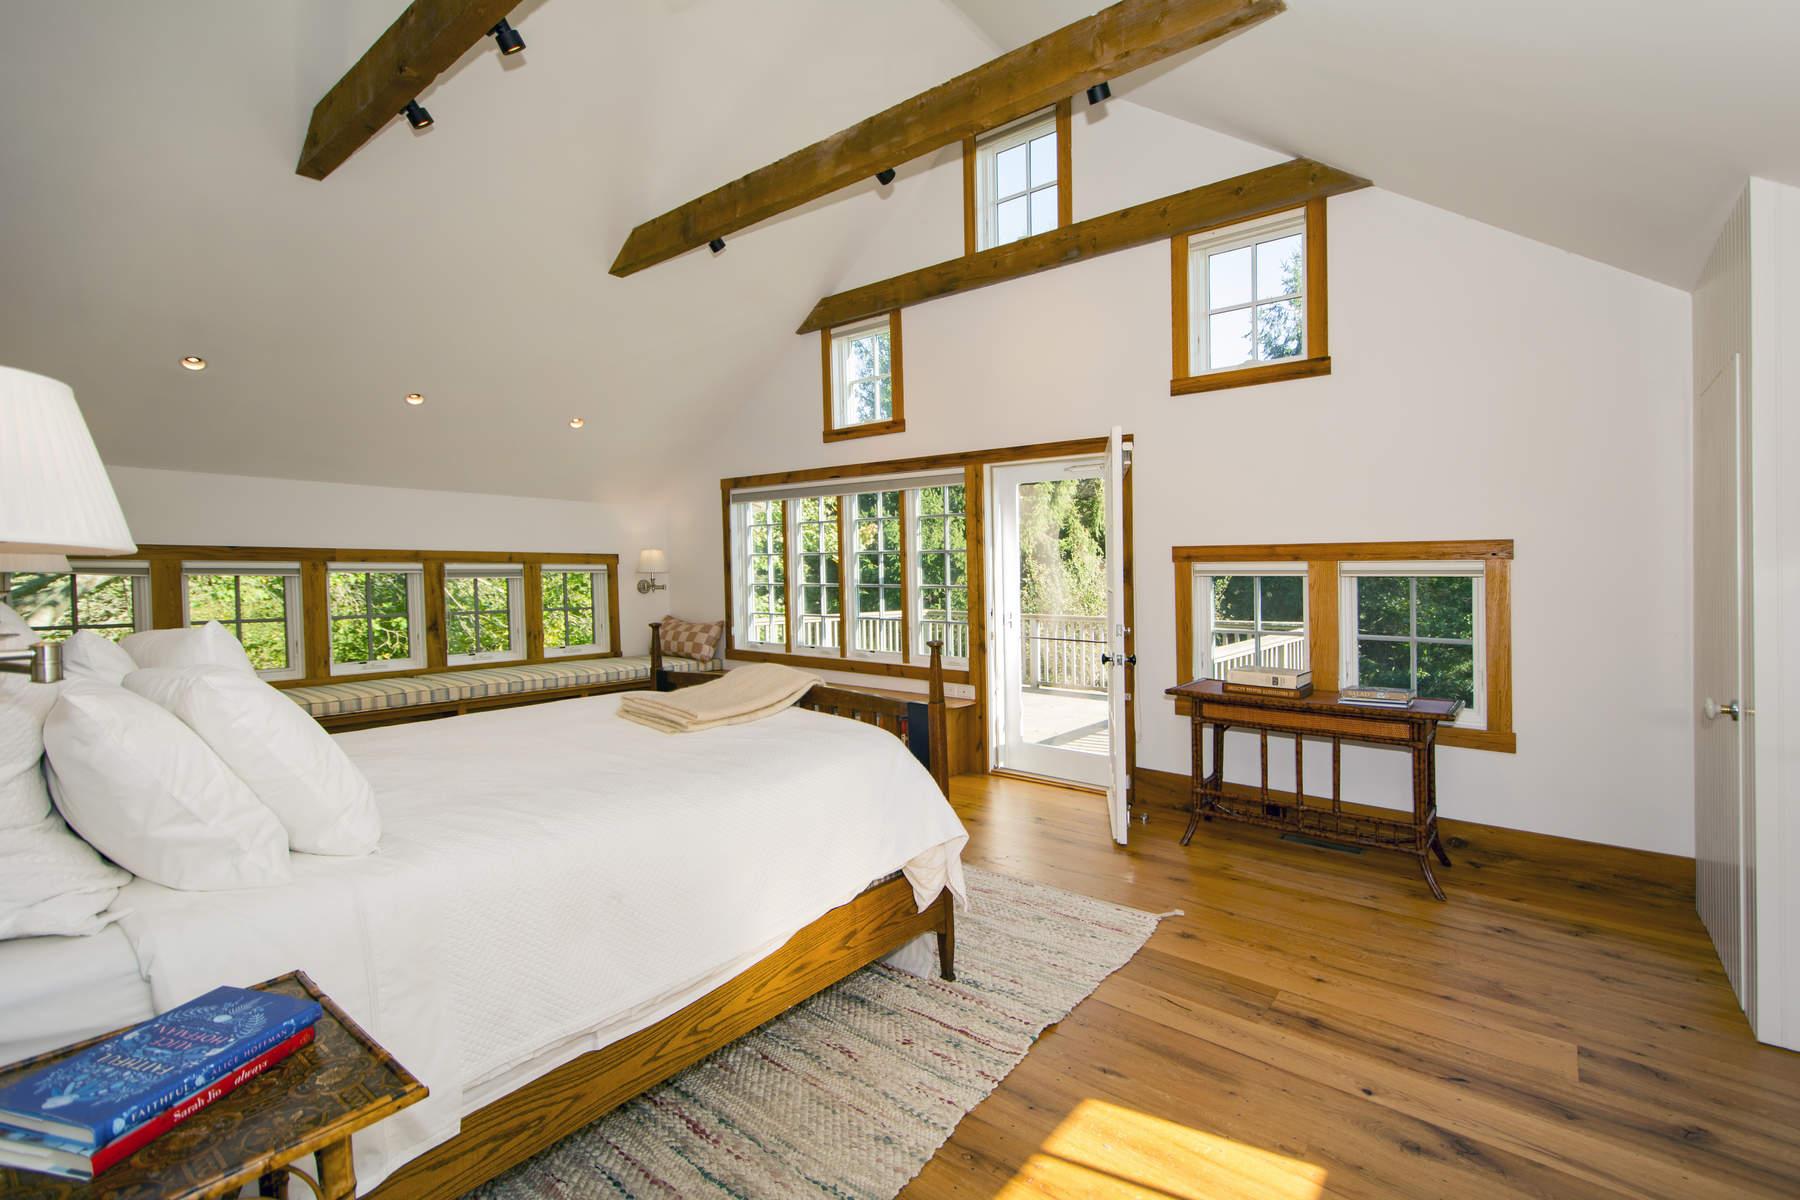 Additional photo for property listing at The Barns At Sagaponack 544 Hedges Lane Sagaponack, New York 11962 United States